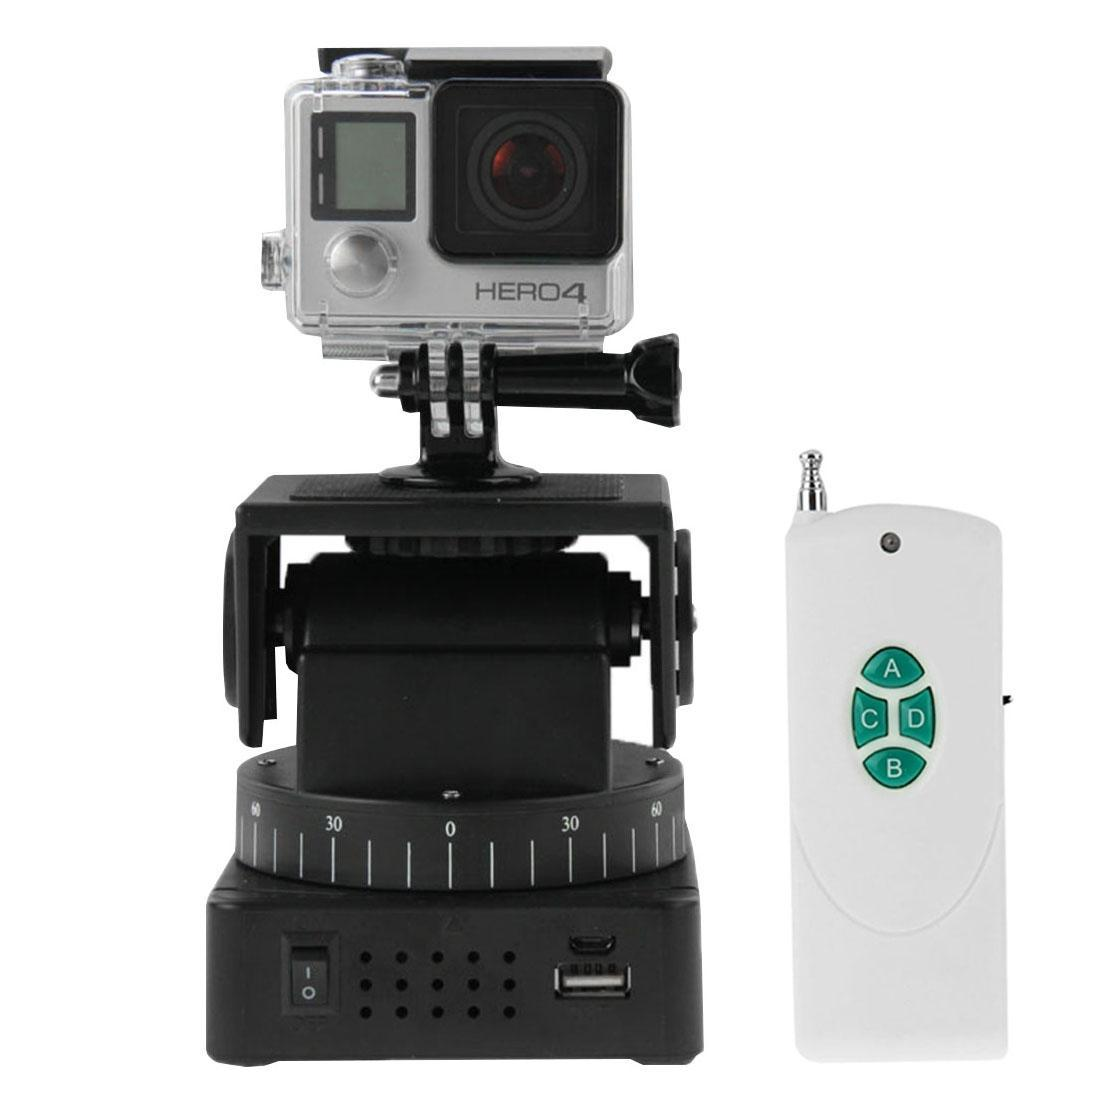 Zifon التحكم عن بعد عموم إمالة الكاميرا لالمتطرفة، واي فاي الكاميرا والهاتف الذكي، النموذج: YT-260